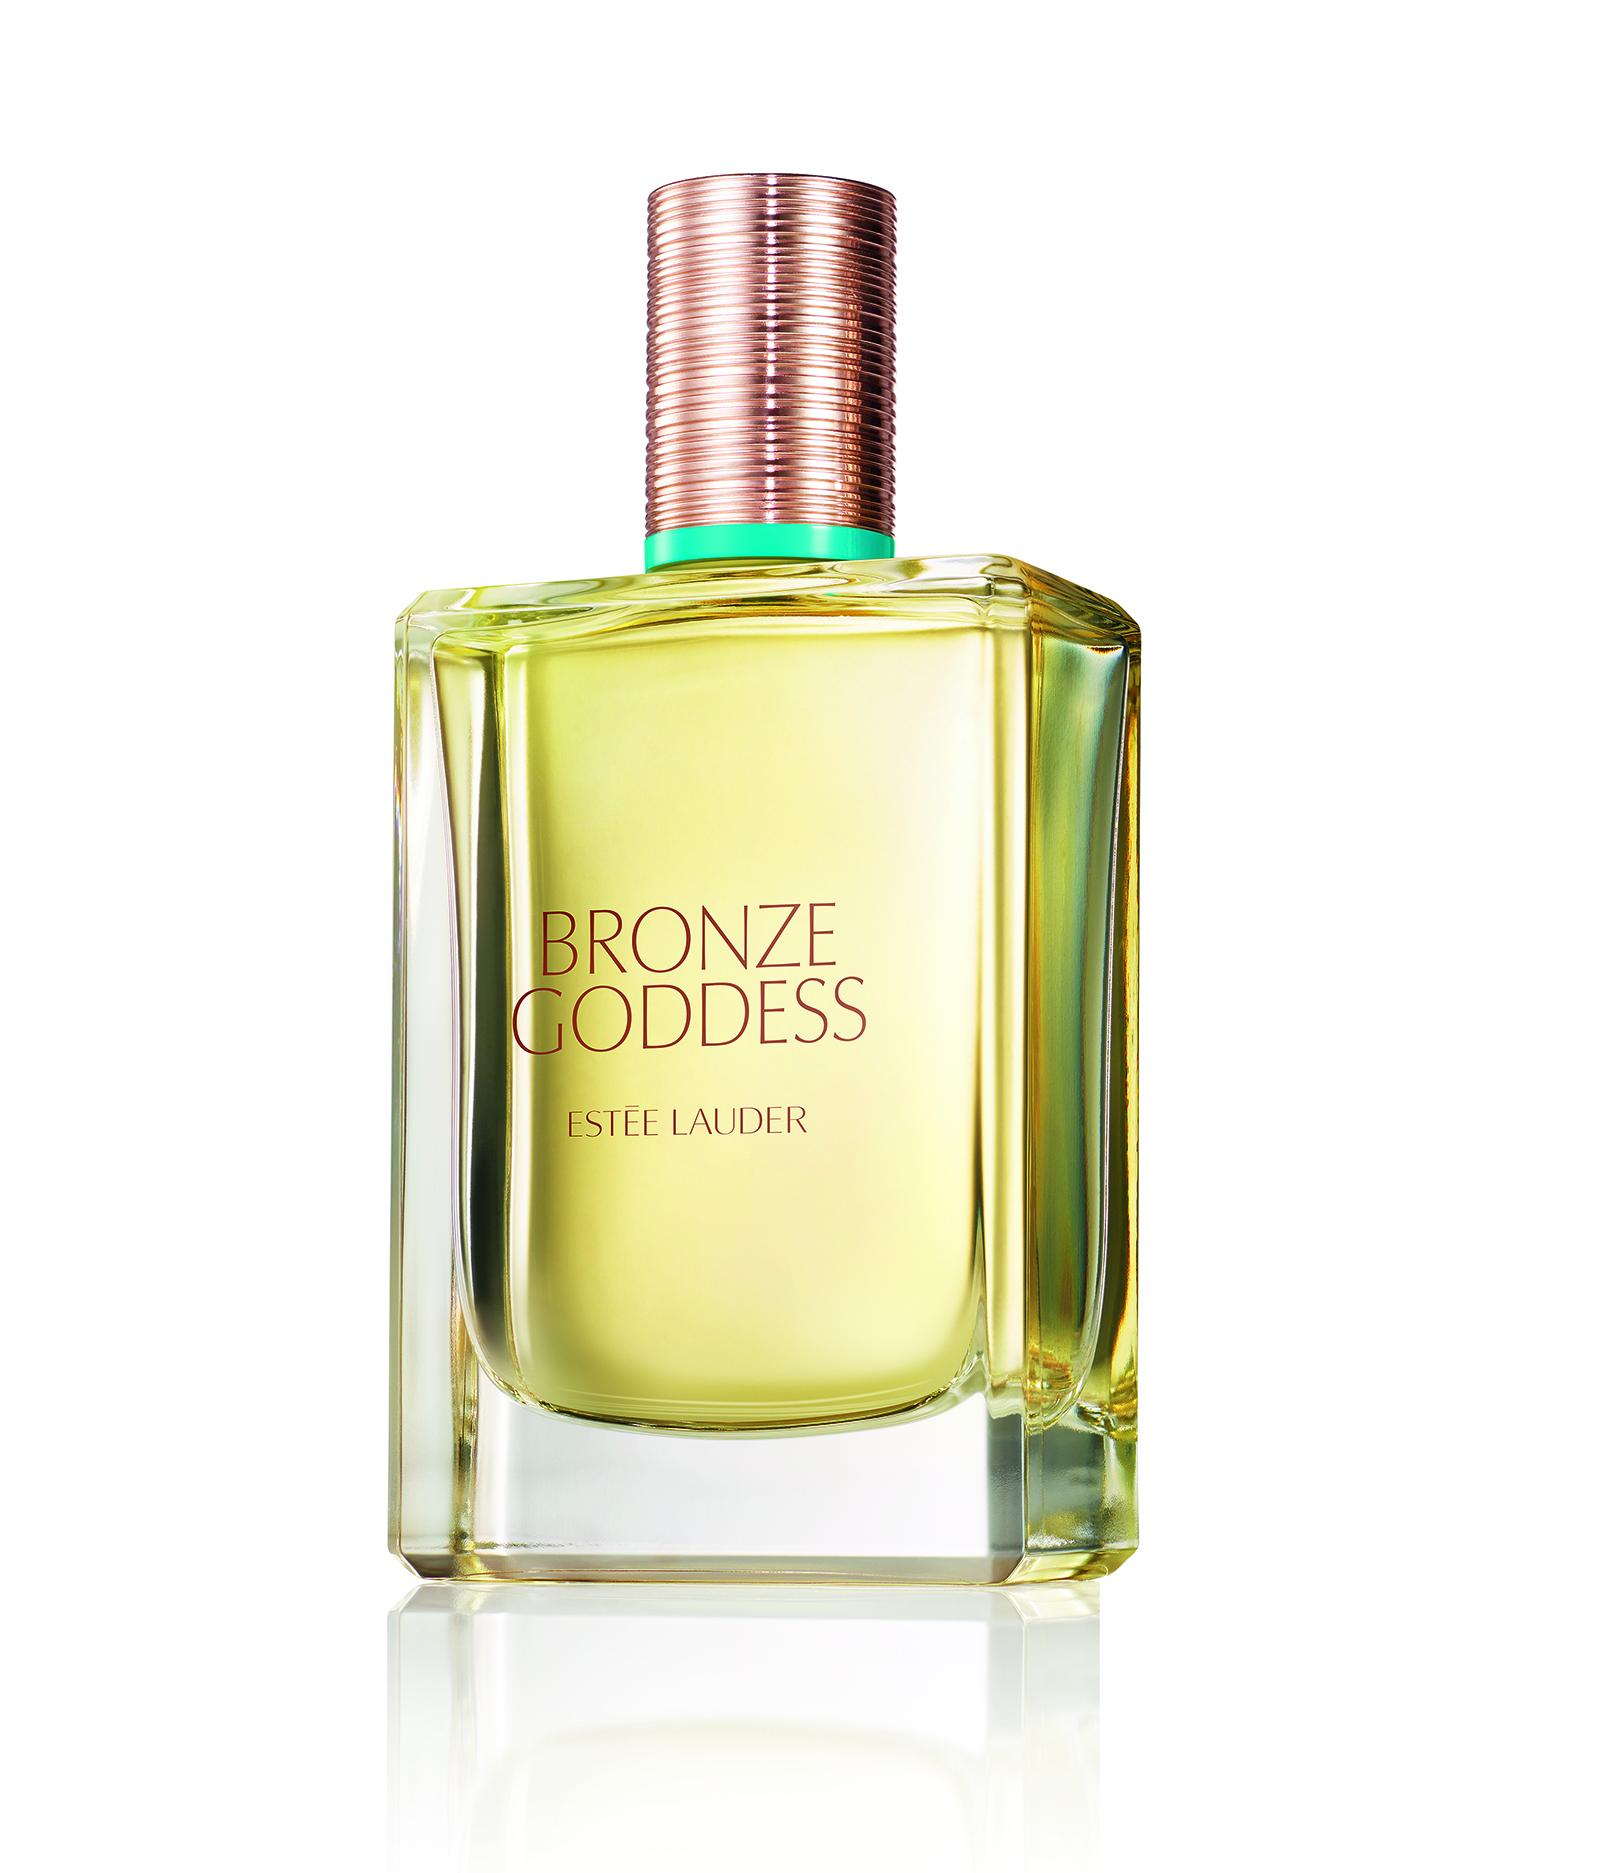 bronze-goddess_product-on-white_eau-fraiche_global_expiry-march-20181.jpg